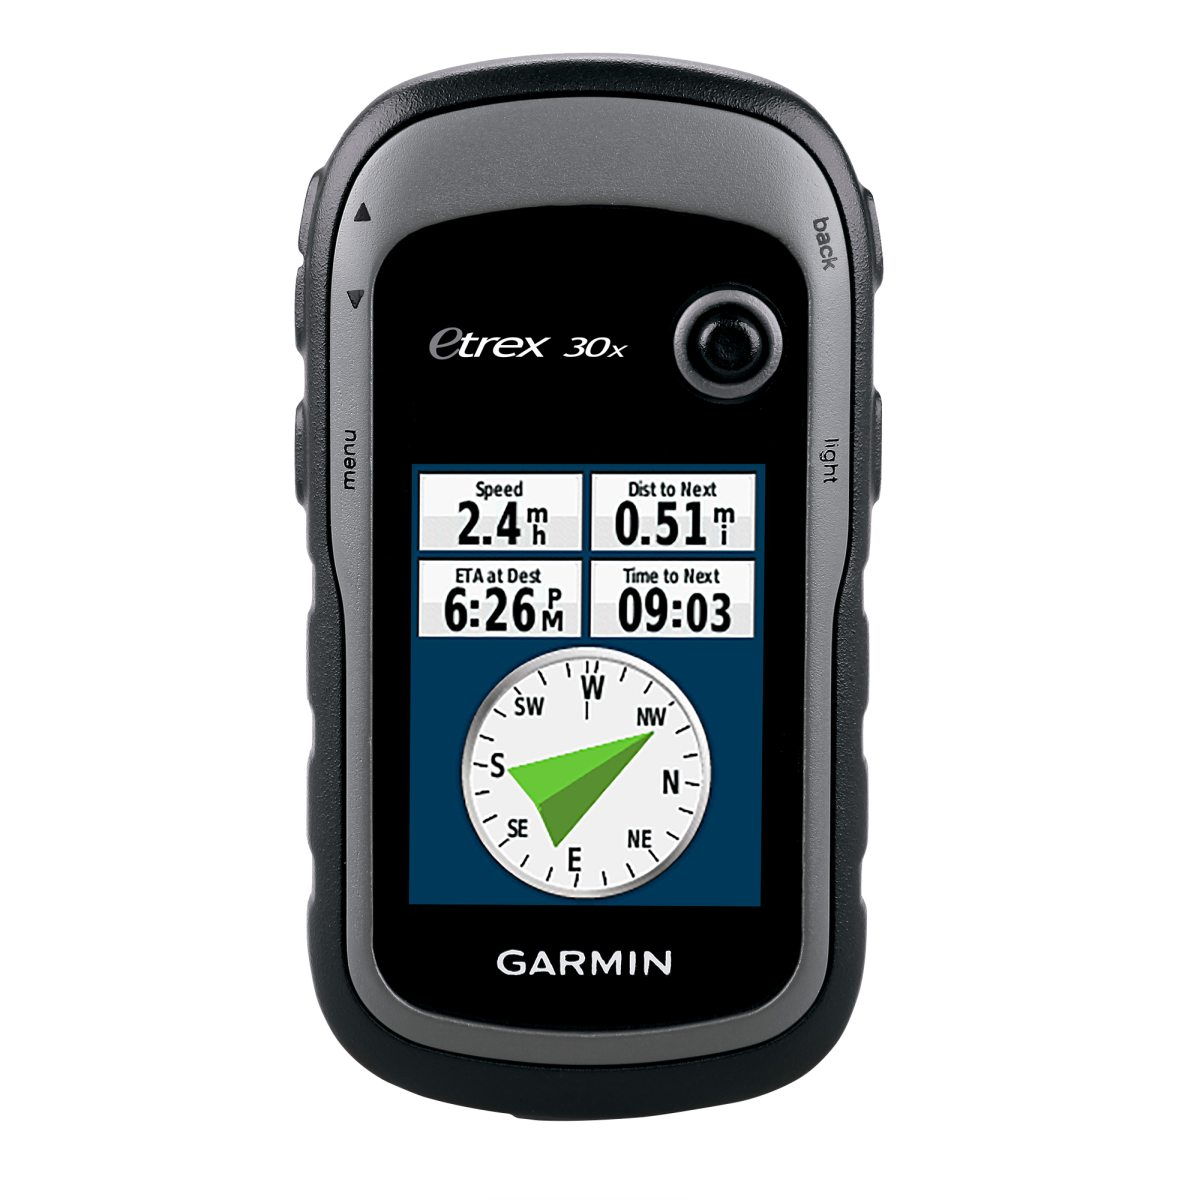 gps kart europa Garmin eTrex 30x, Vest Europa, GPS m/ kart   gps kart europa